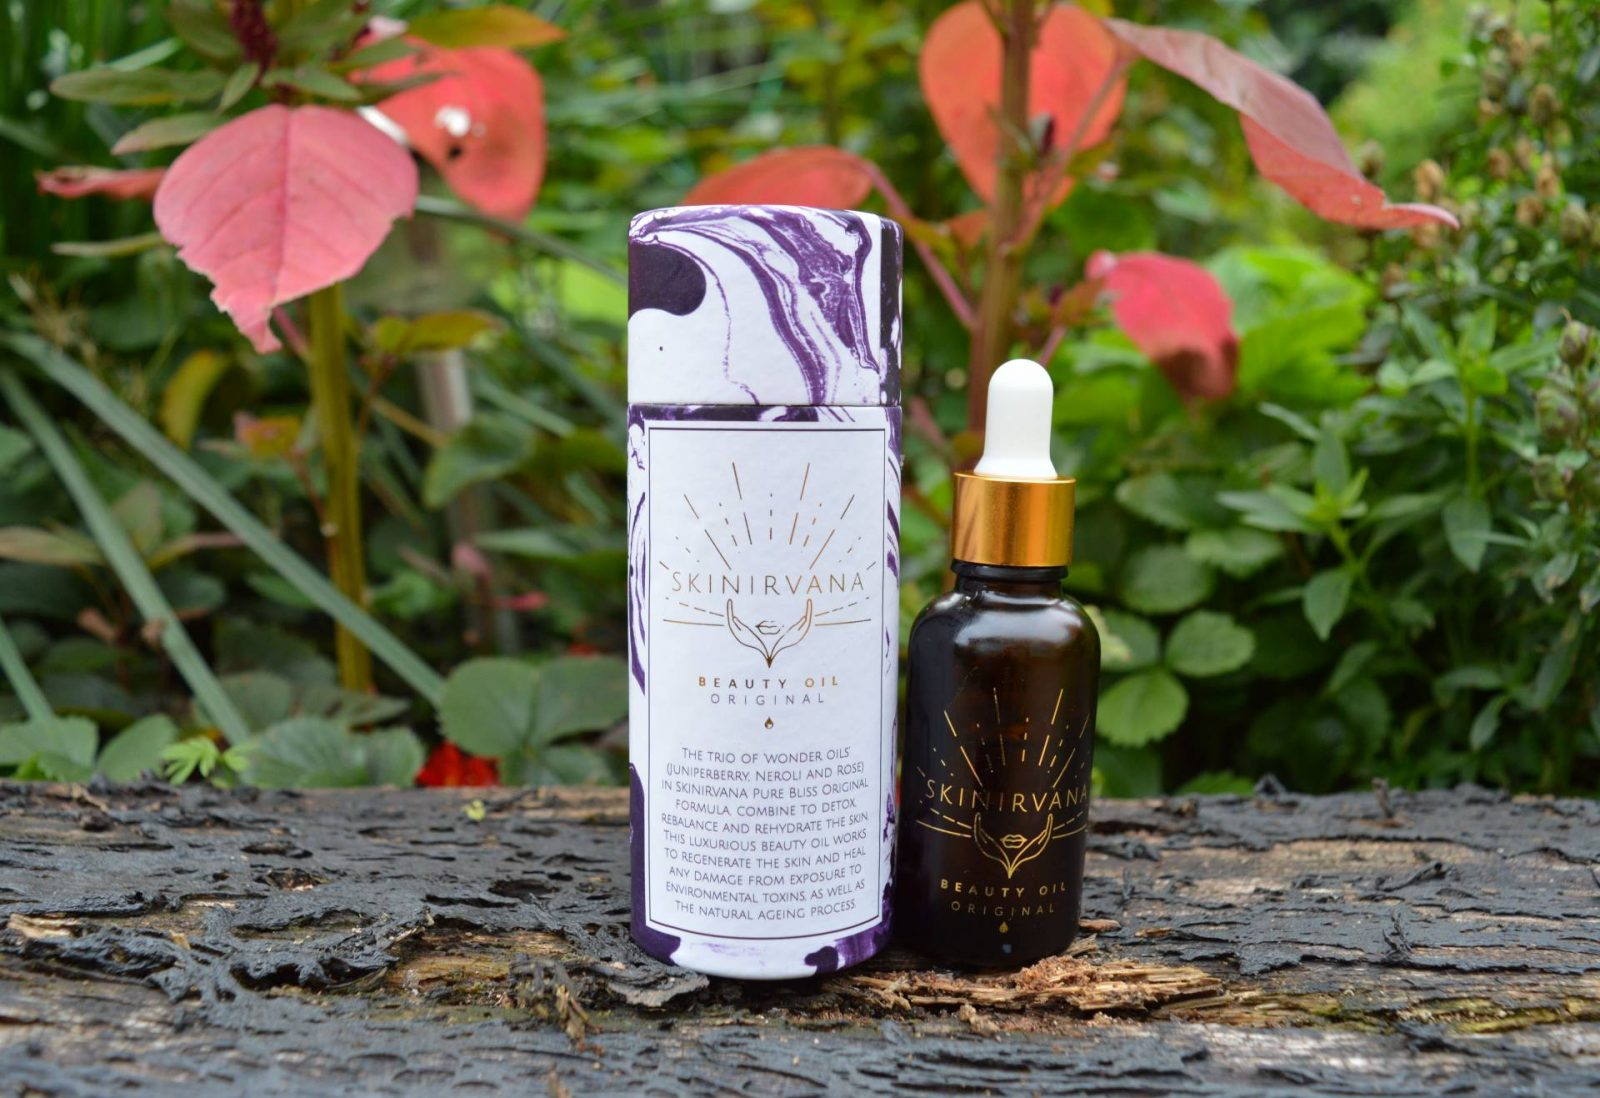 October Beauty Favourites, Skinirvana beauty oil